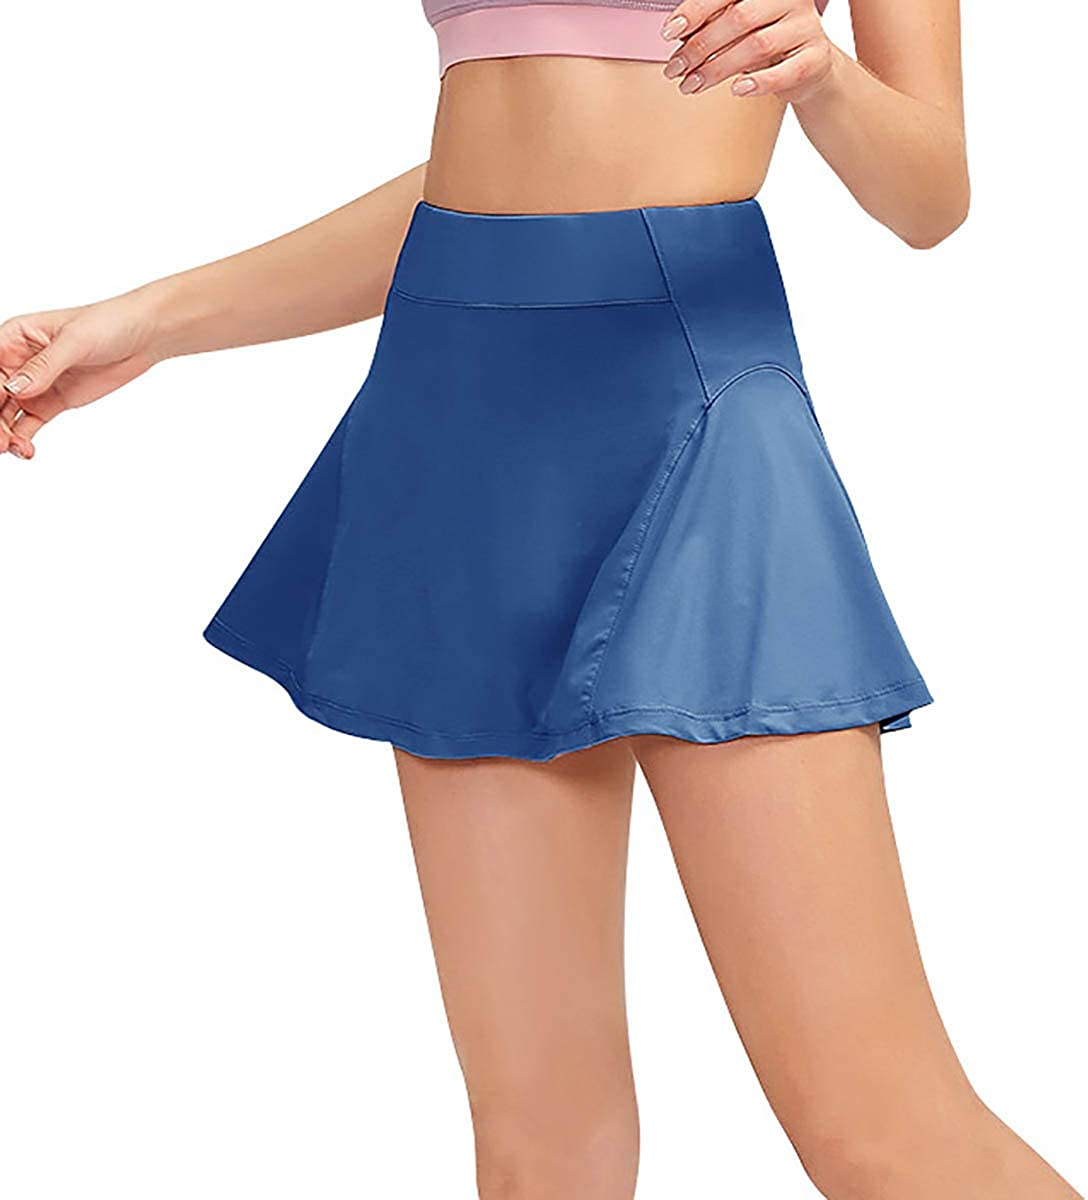 TOPMELON Ranking TOP4 Women's Tennis Skort Quick W Skirt Yoga Beauty products Dry Ruffle